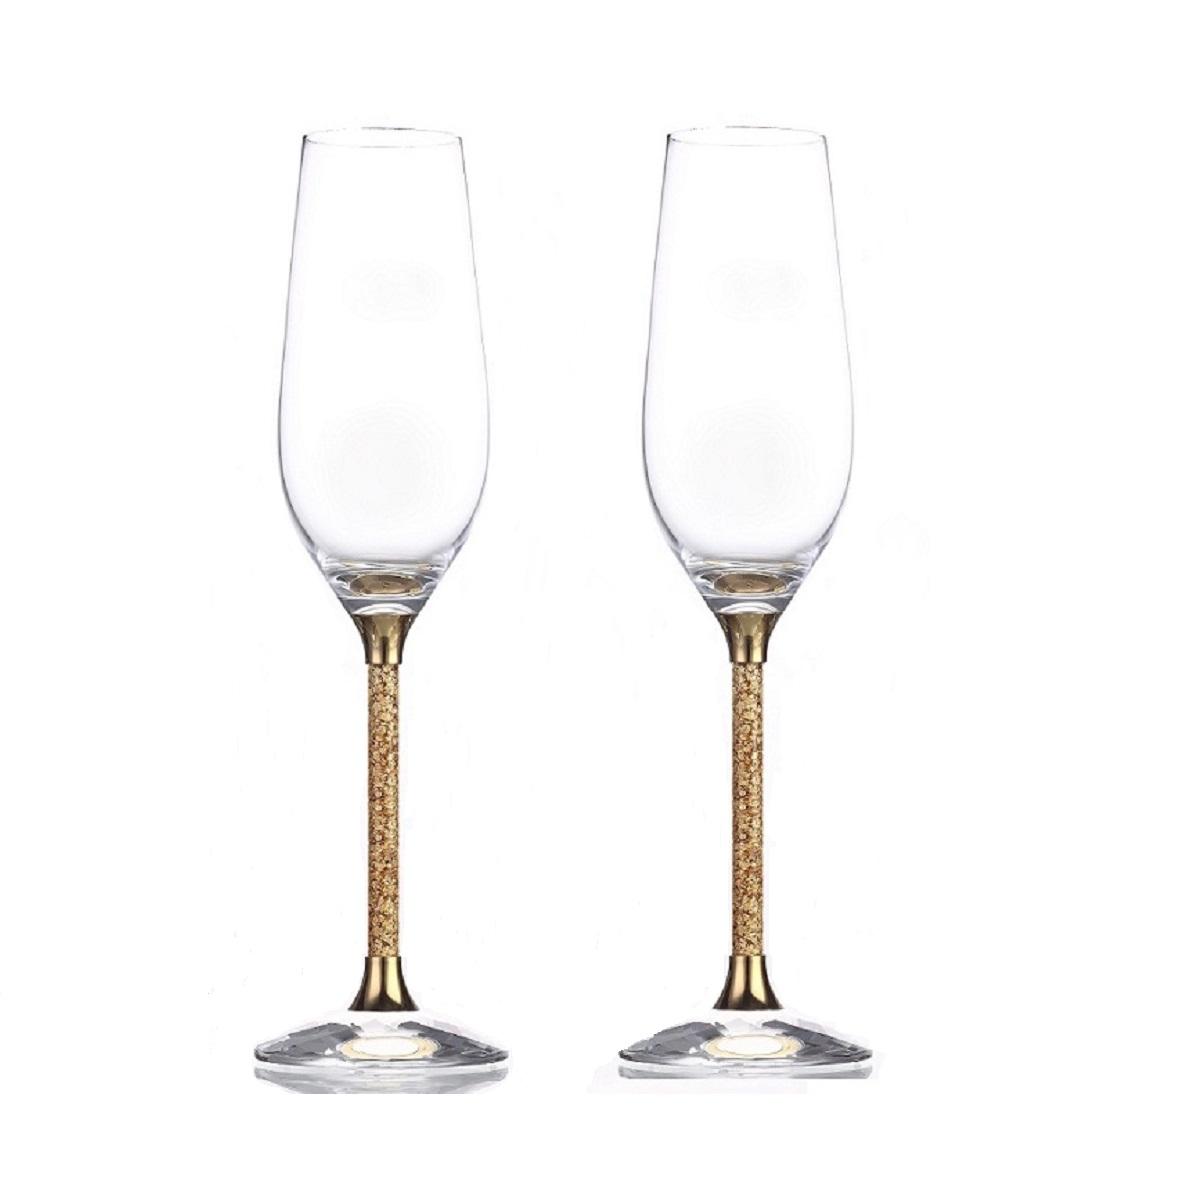 / Glassware / Pair of 24ct Gold Leaf Stem Crystal Champagne Flutes